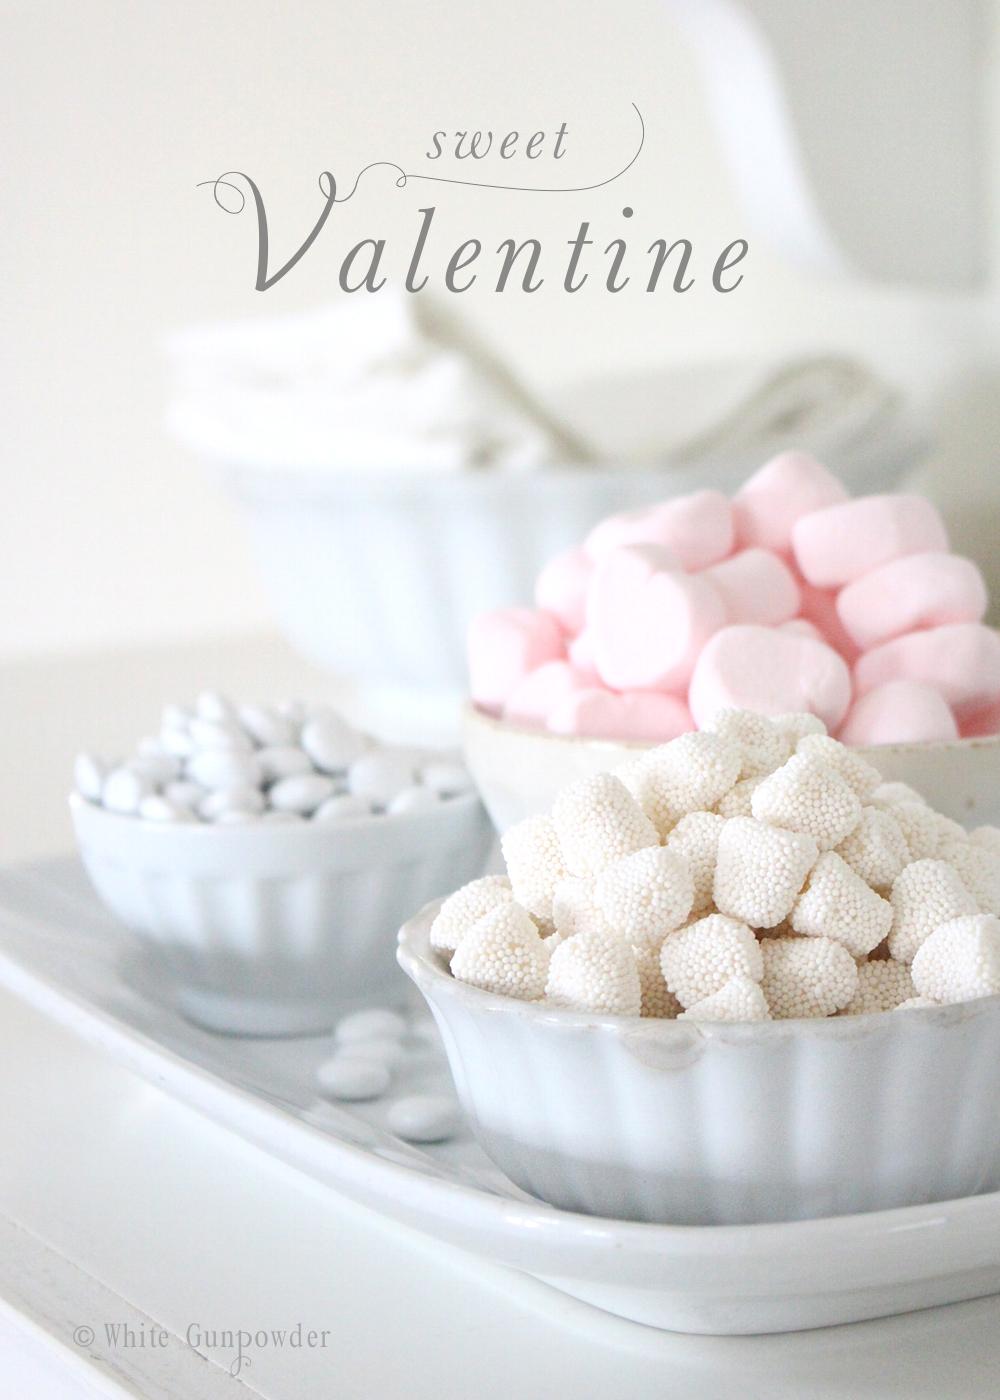 Sweet Valentine's Day Treats & Gifts - White Gunpowder